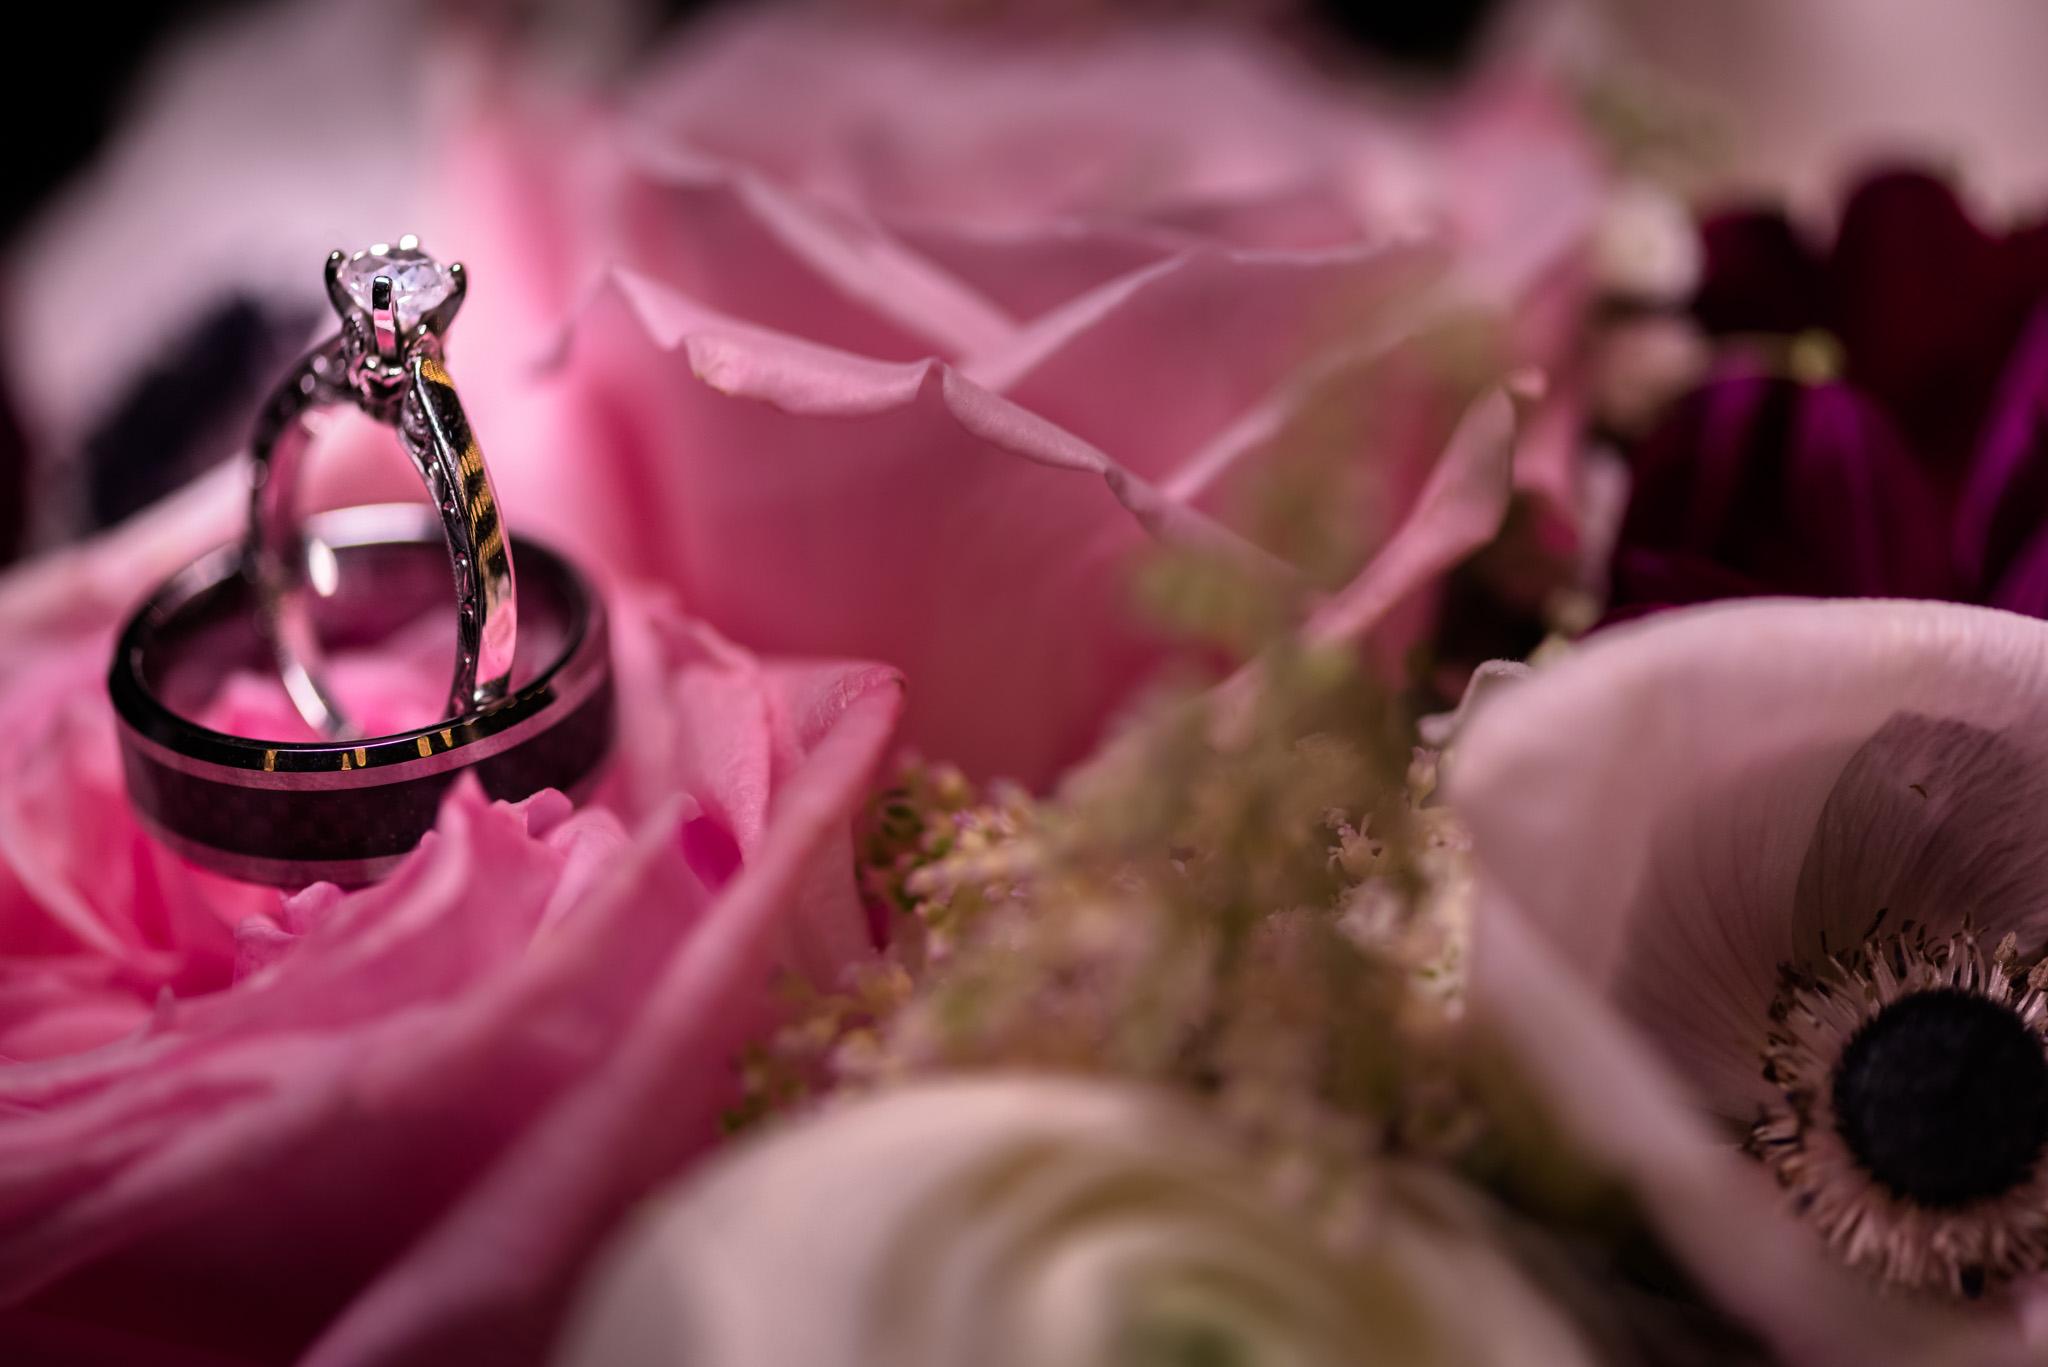 Avensole-Winery-Temecula-Wedding-Josh-and-Olivia-3933.JPG